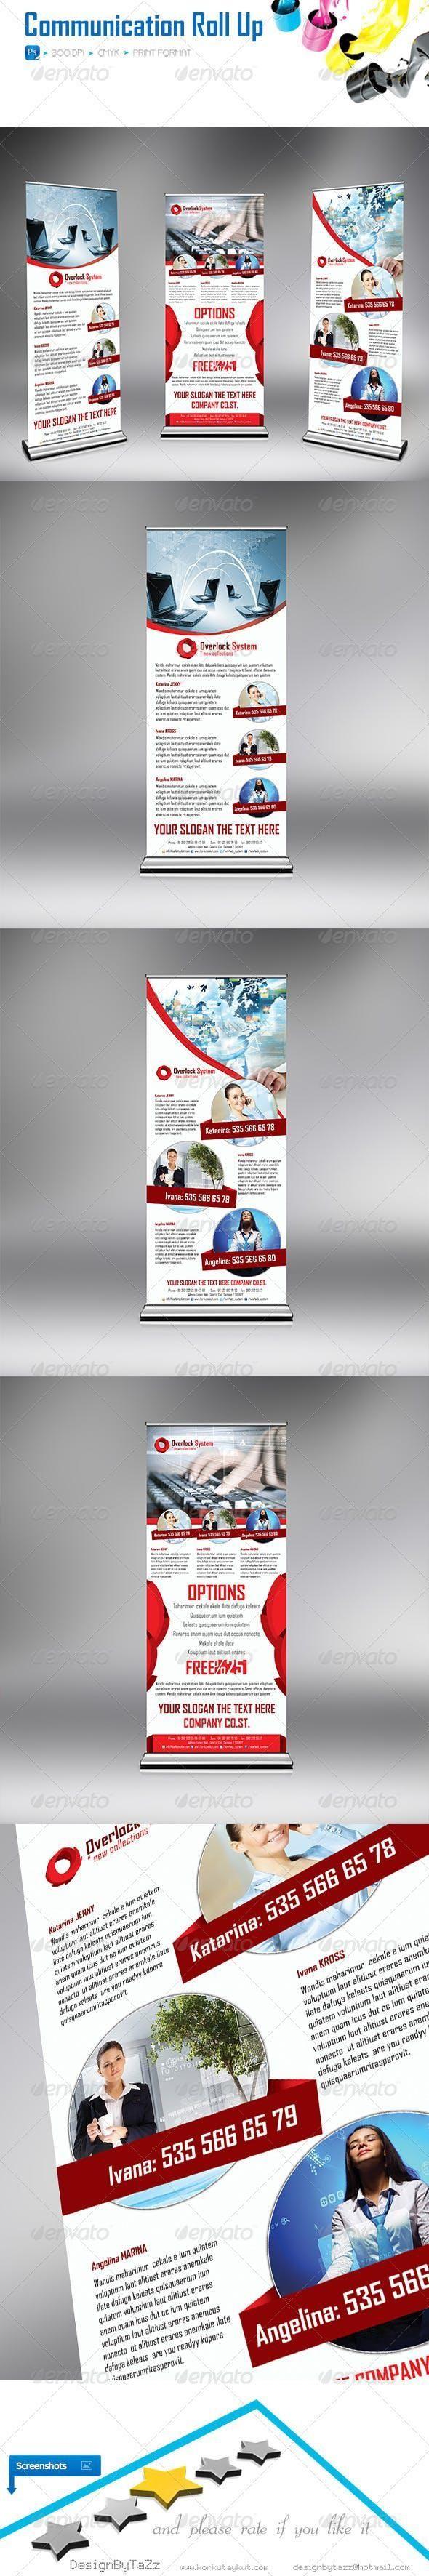 Overlock System Roll-Up #SignageTemplates #SignageDesign #marketing #signage #co...